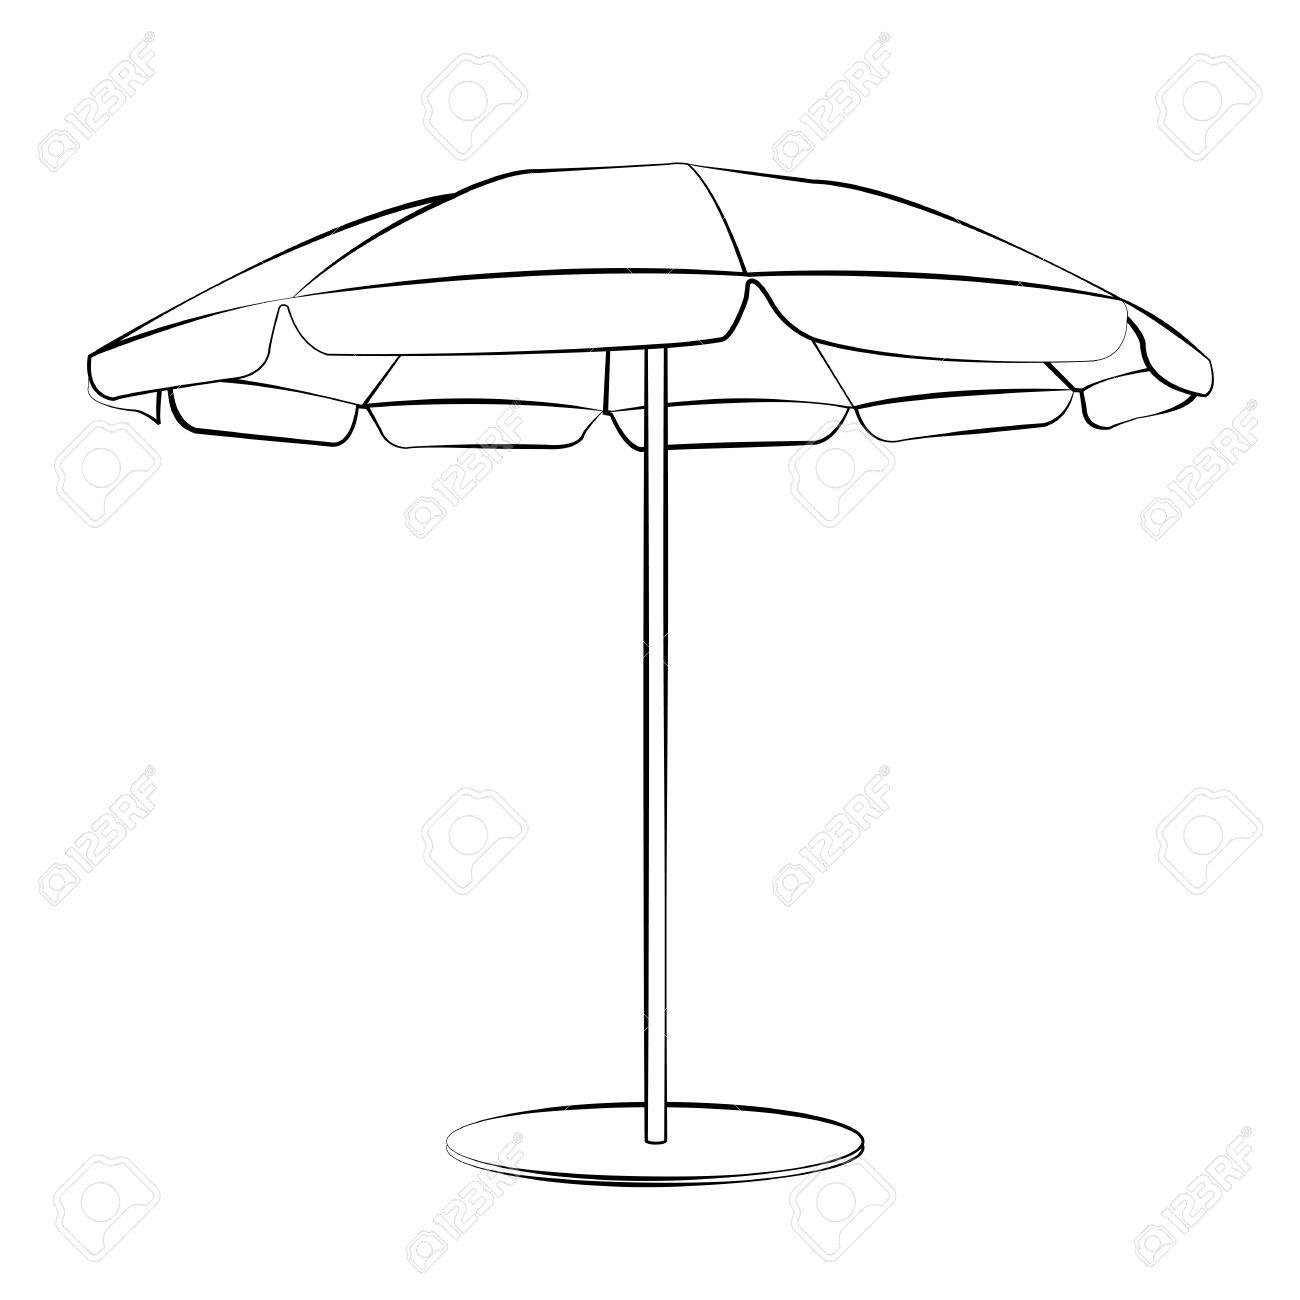 Beach Umbrella Outline Clipart.